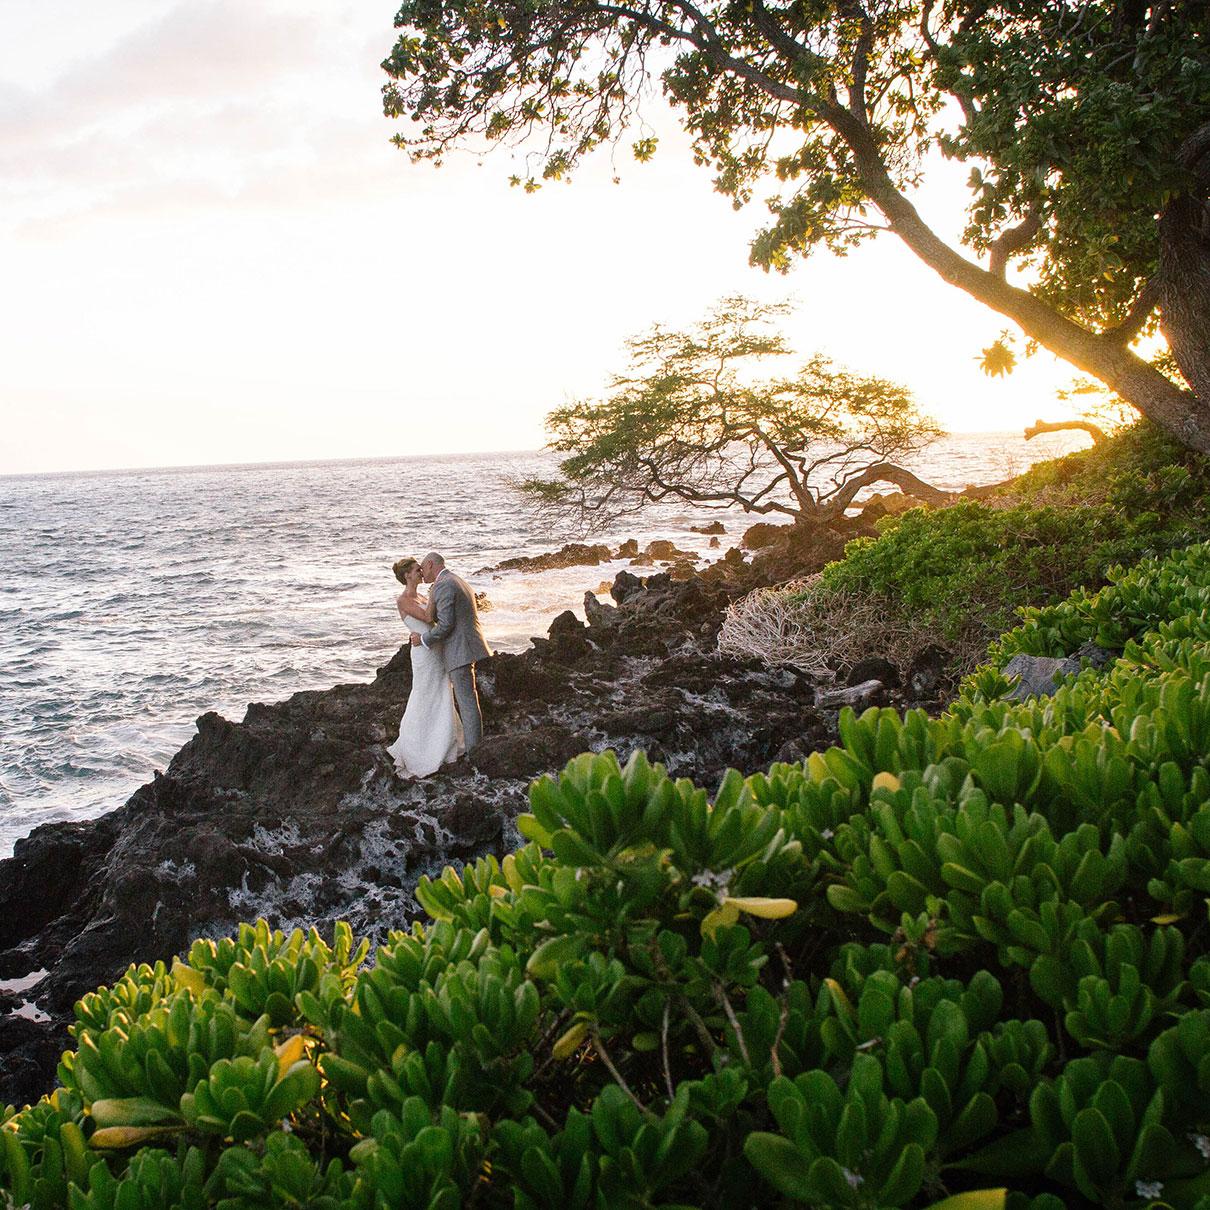 Hawaii Destination Wedding.Will The Volcano Eruption Affect Your Destination Wedding In Hawaii